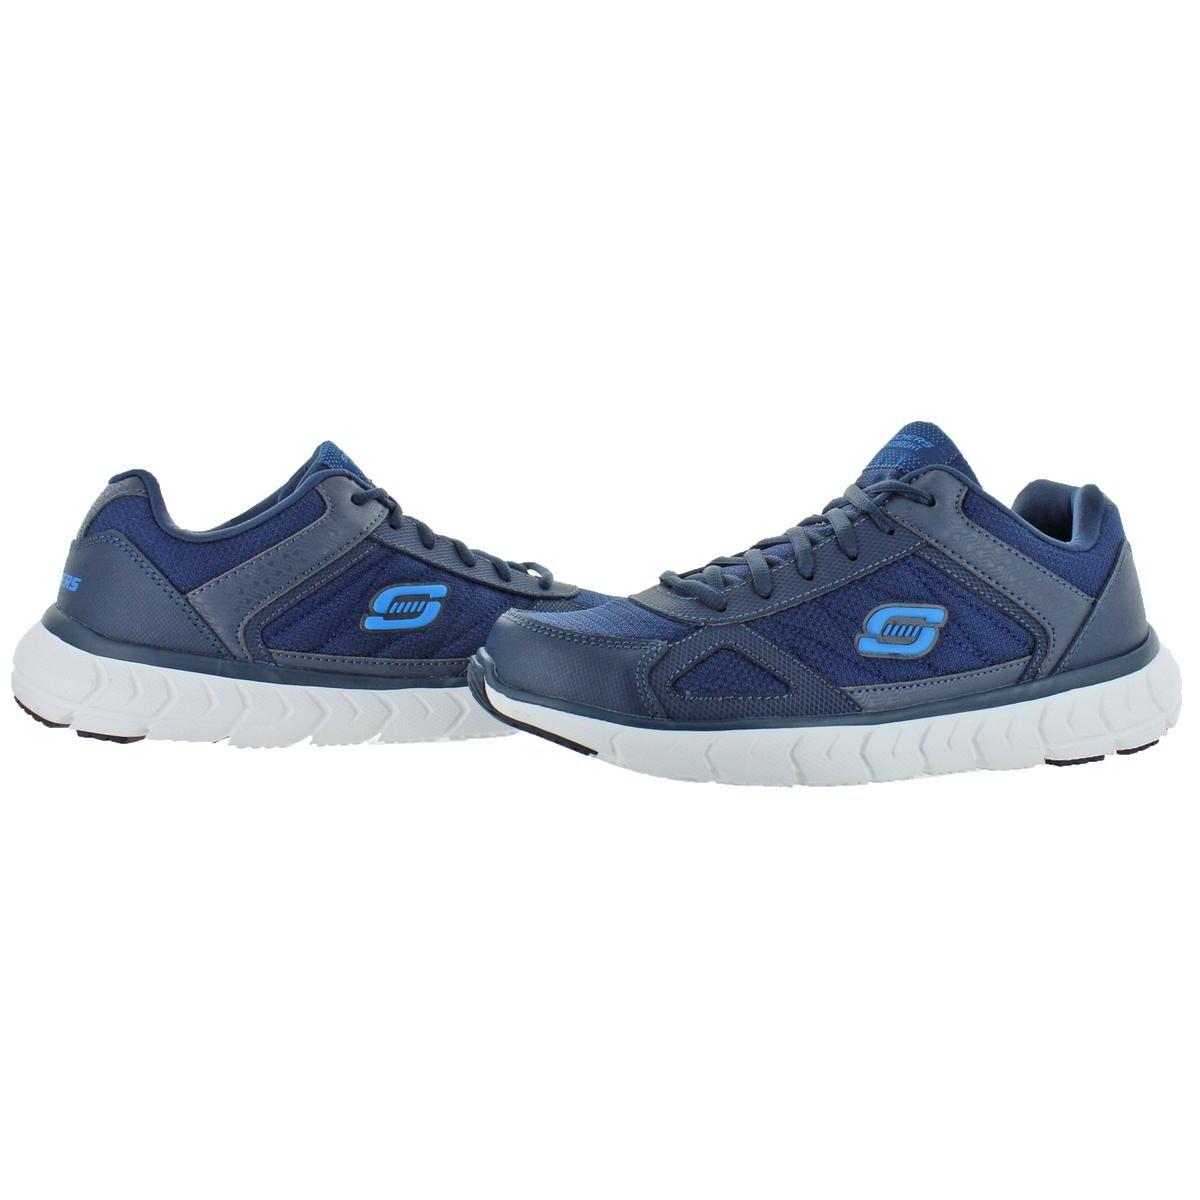 ca5da18d71110 Shop Skechers Mens Soleus-Distort Walking Shoes Leather Memory Foam - Free  Shipping On Orders Over $45 - Overstock - 27036904